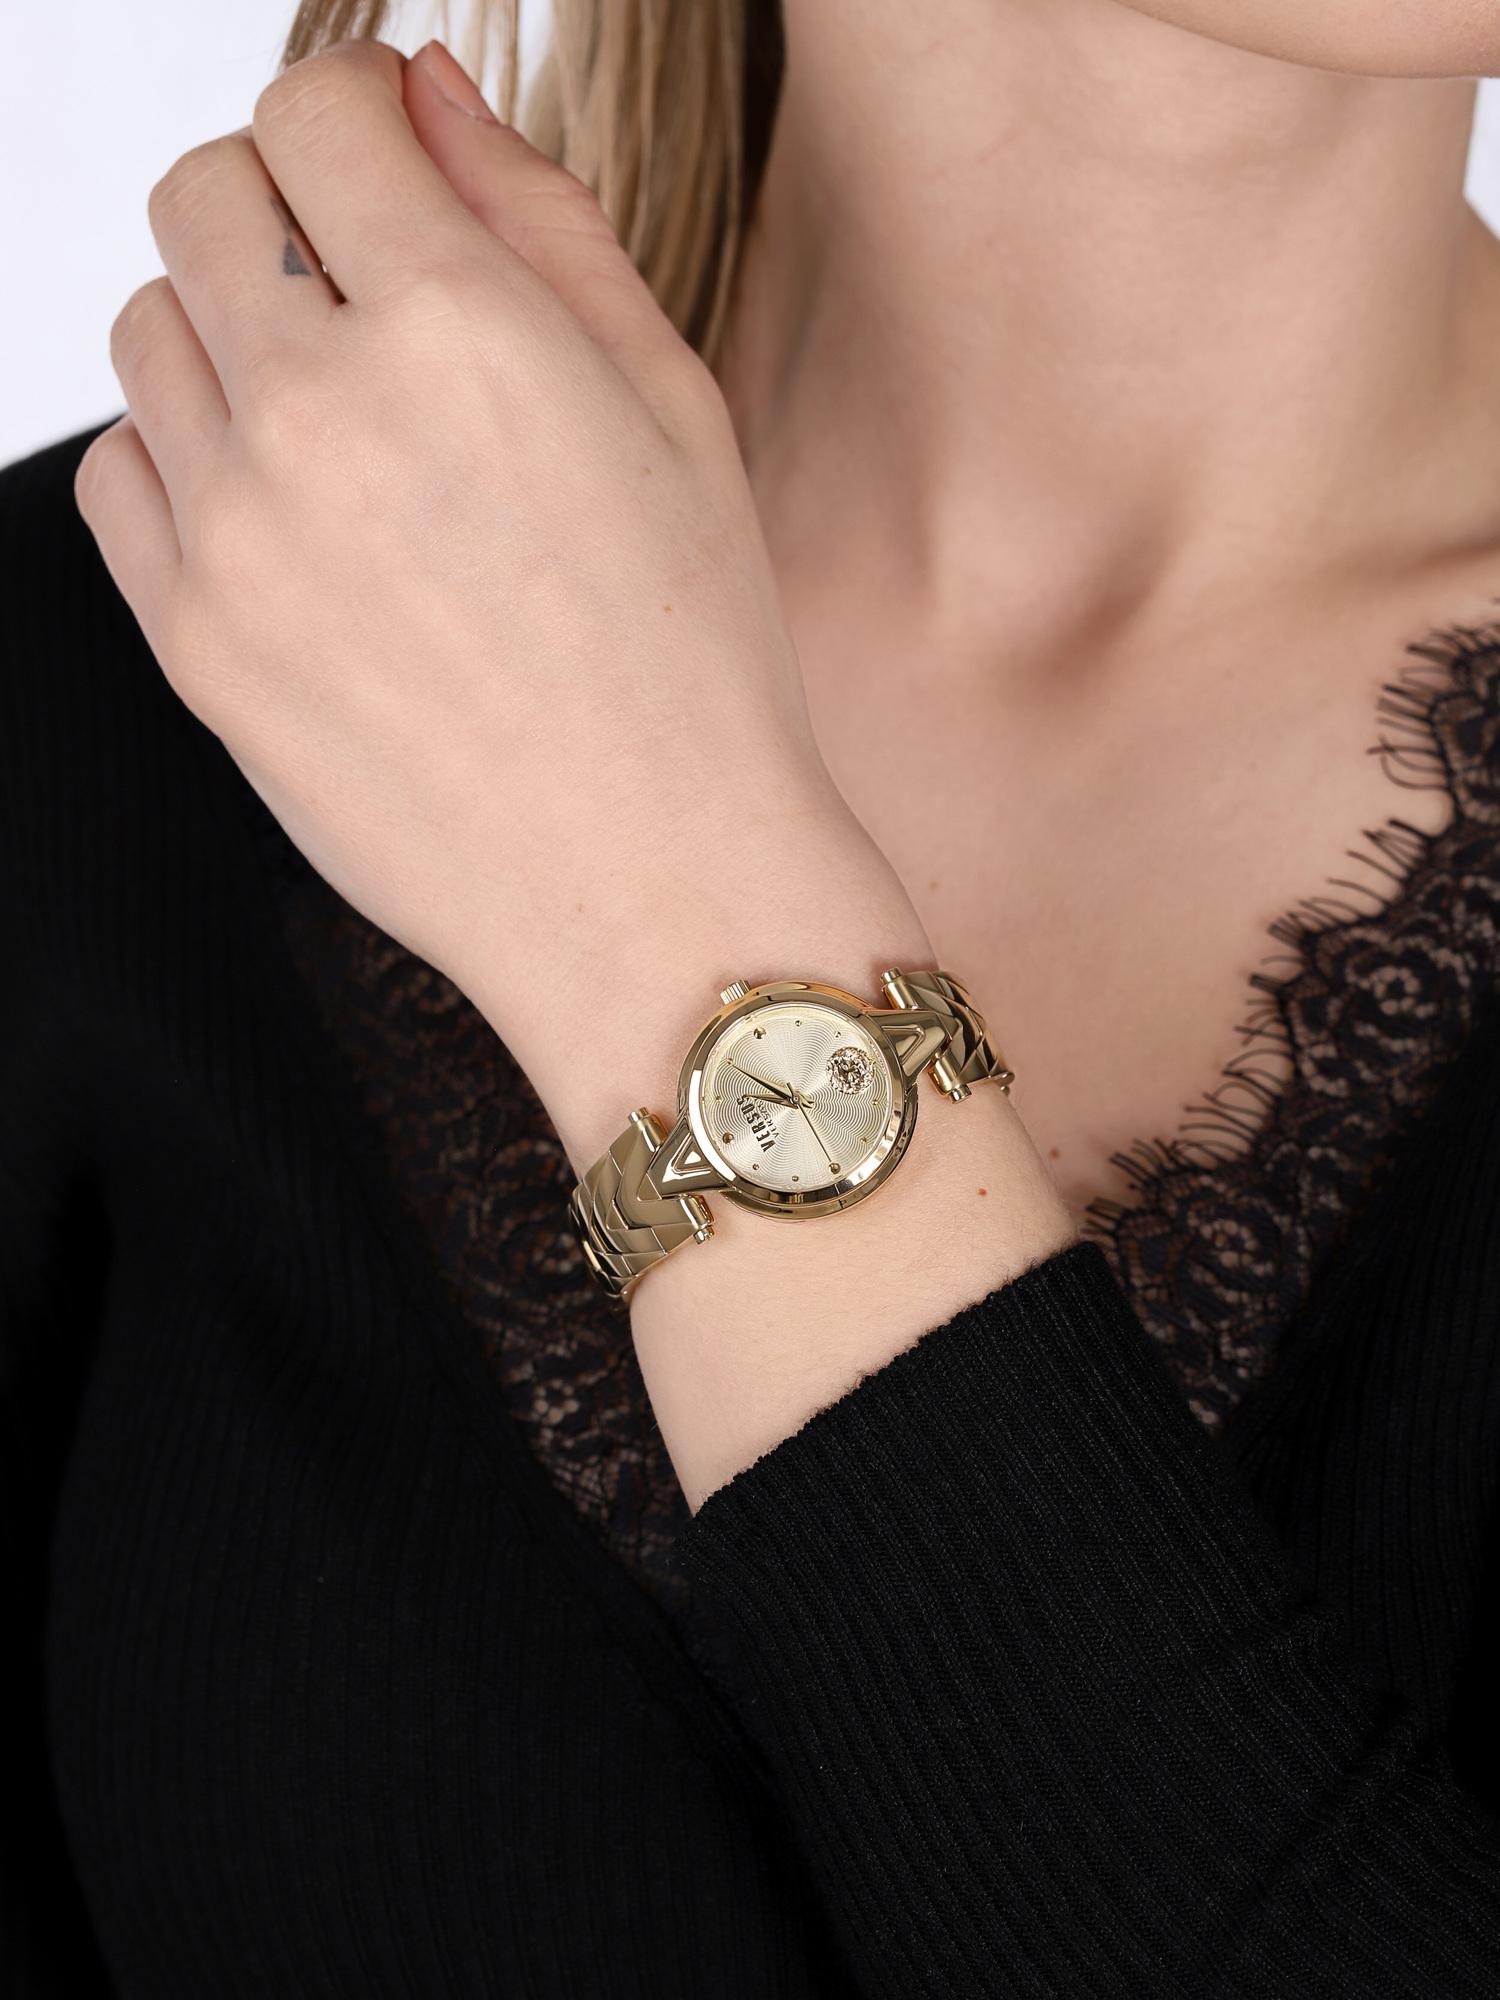 Versus Versace VSPVN0820 zegarek złoty klasyczny Damskie bransoleta